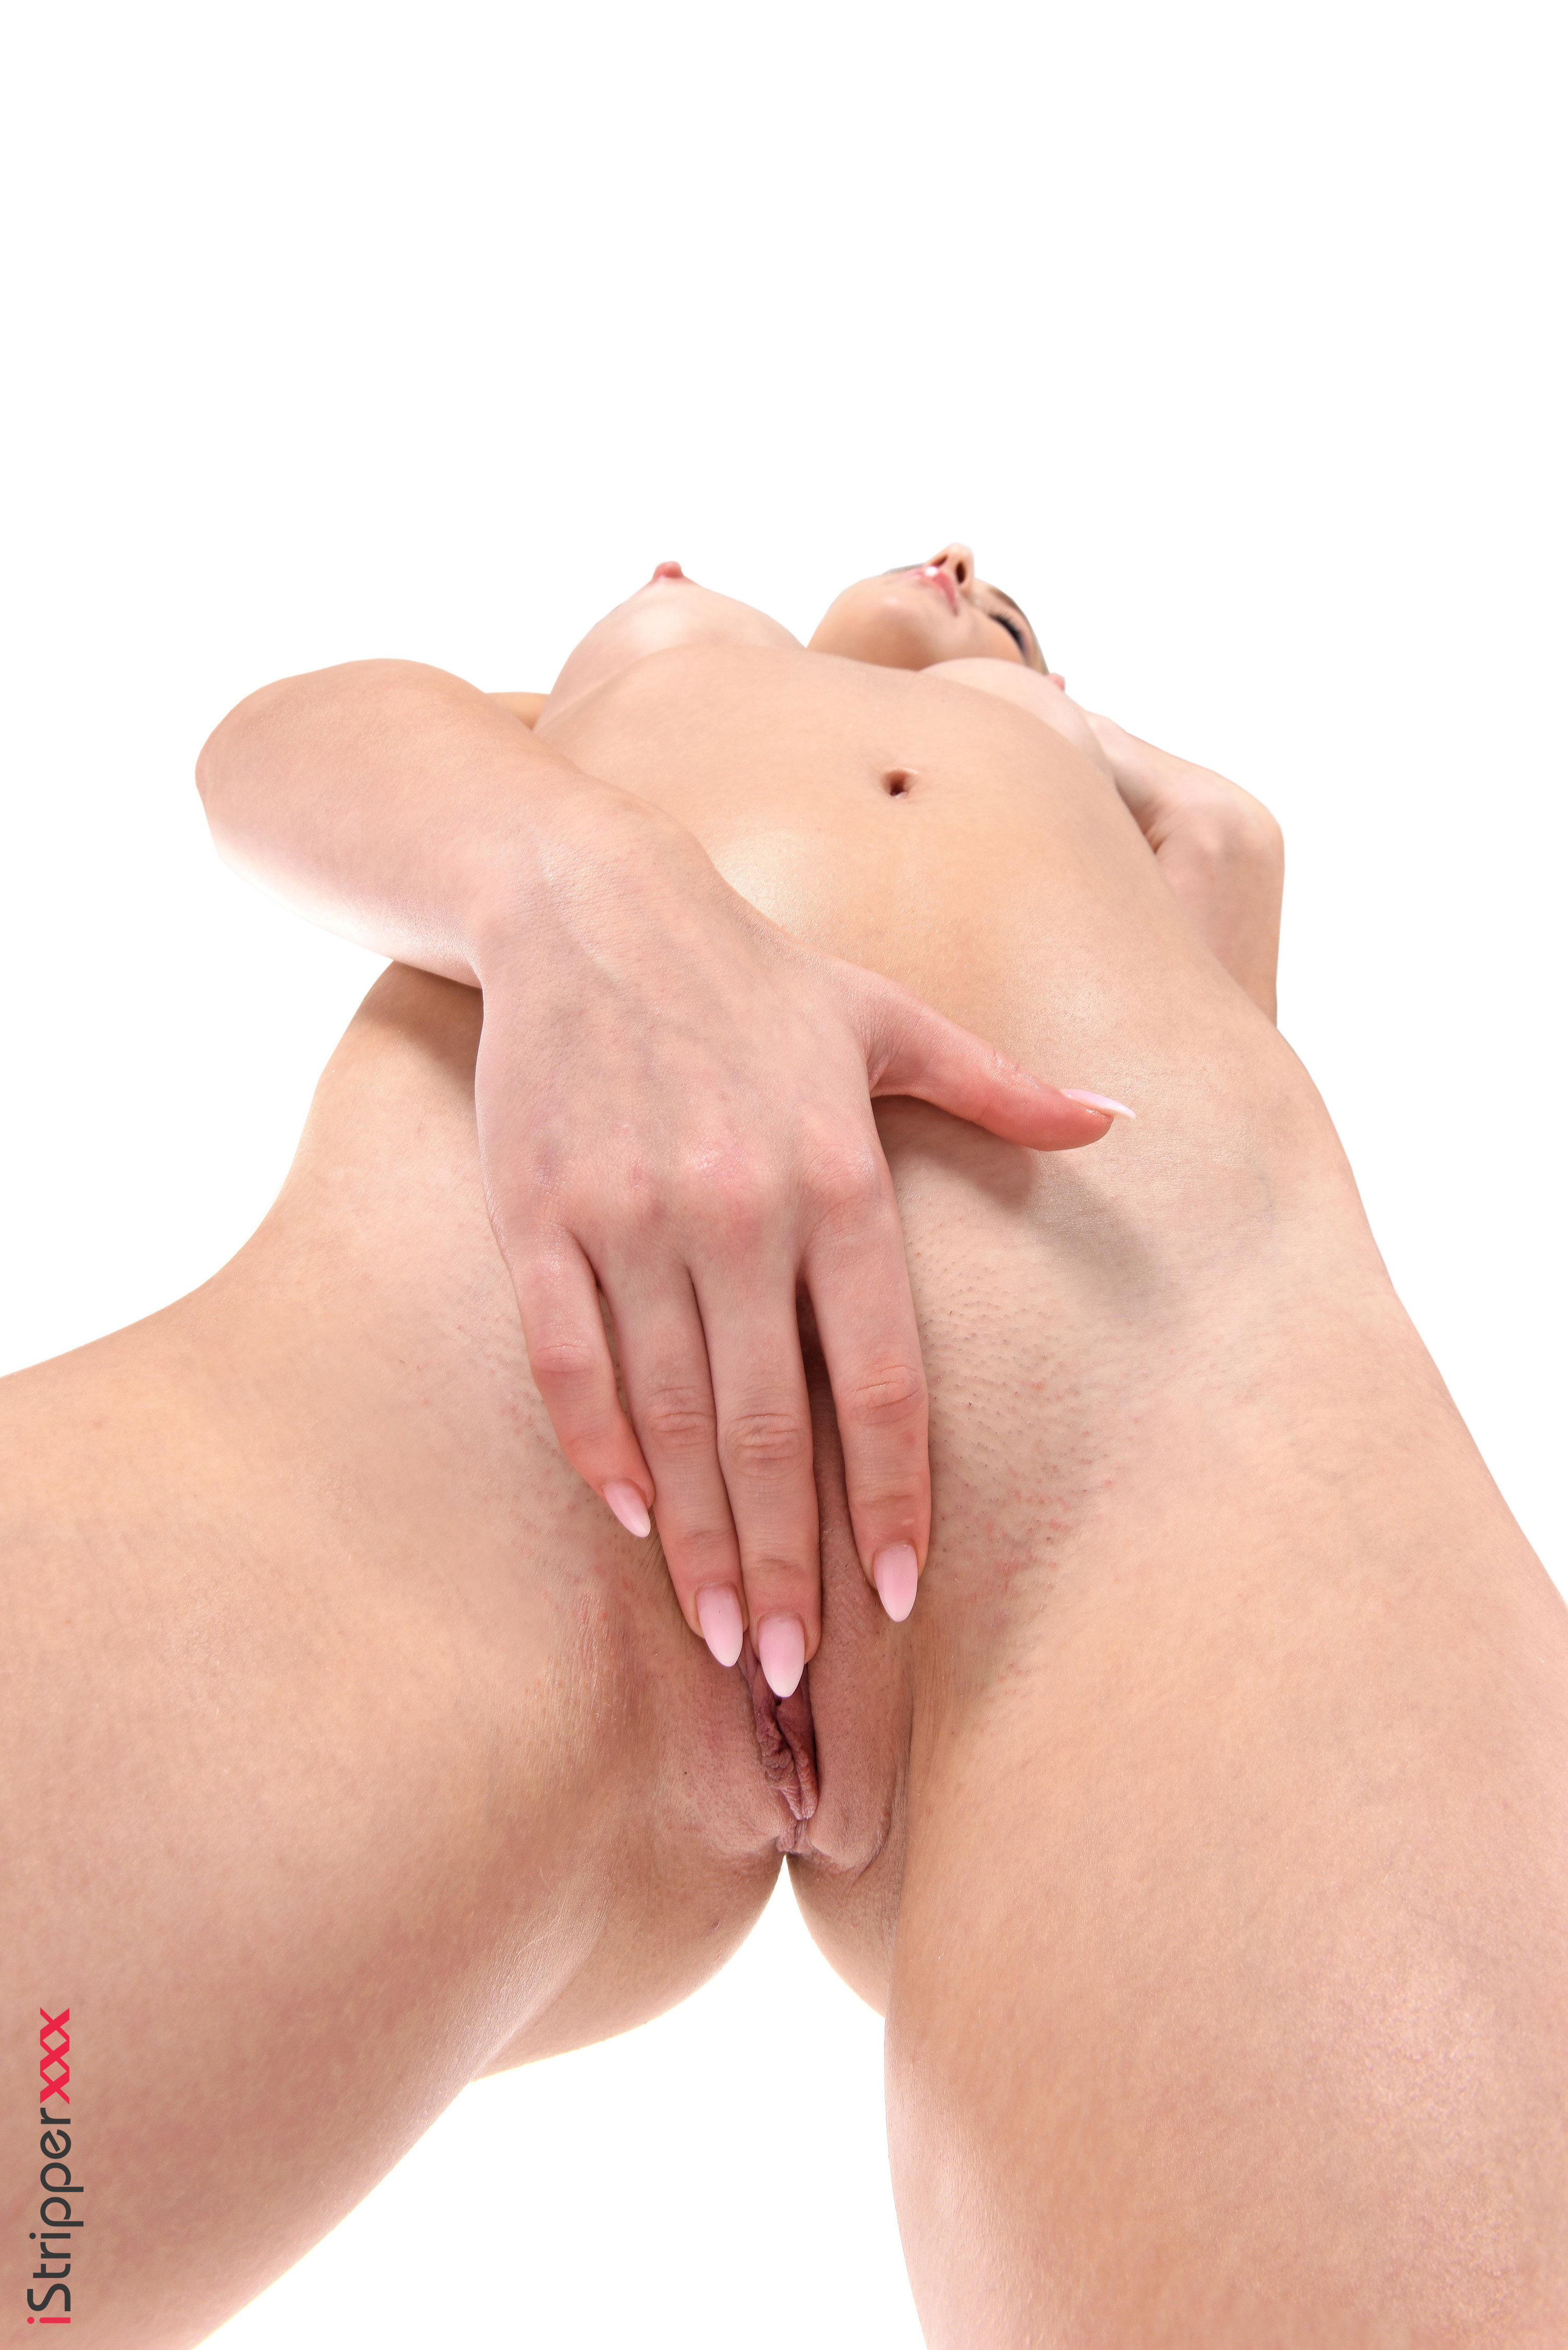 vagina pics free